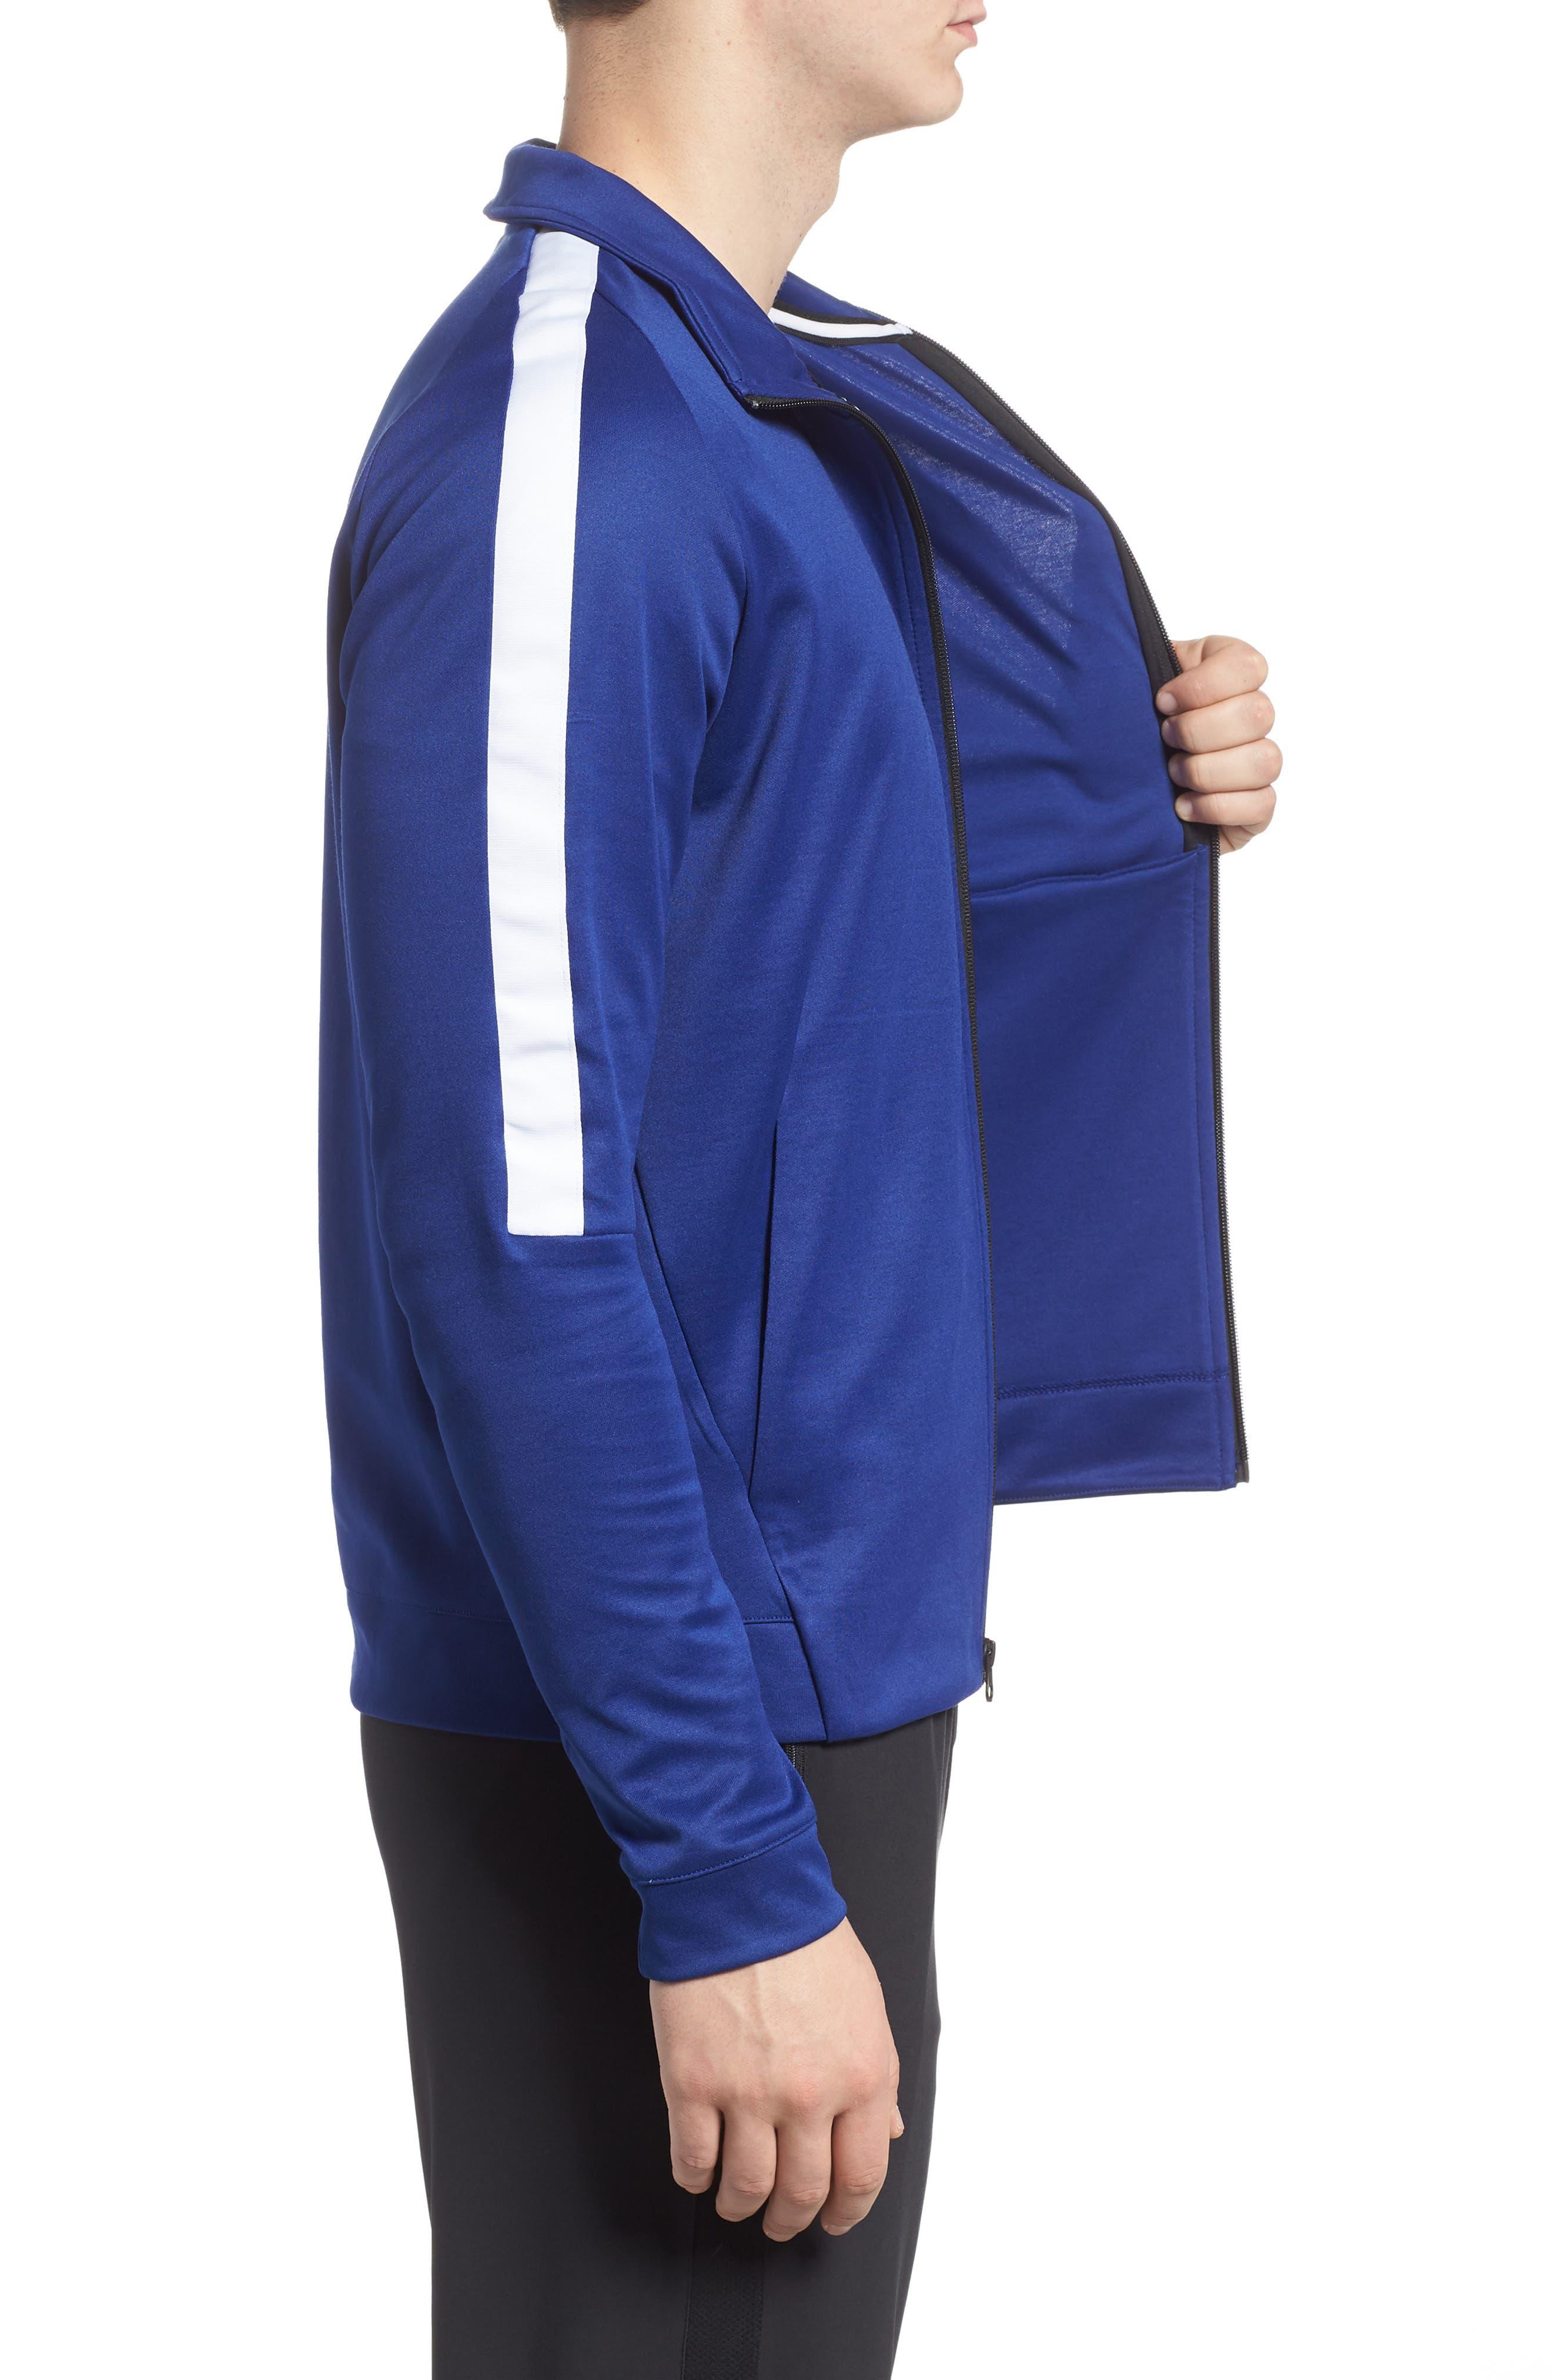 Sportswear Zip Track Jacket,                             Alternate thumbnail 3, color,                             DEEP ROYAL BLUE/ WHITE/ BLACK